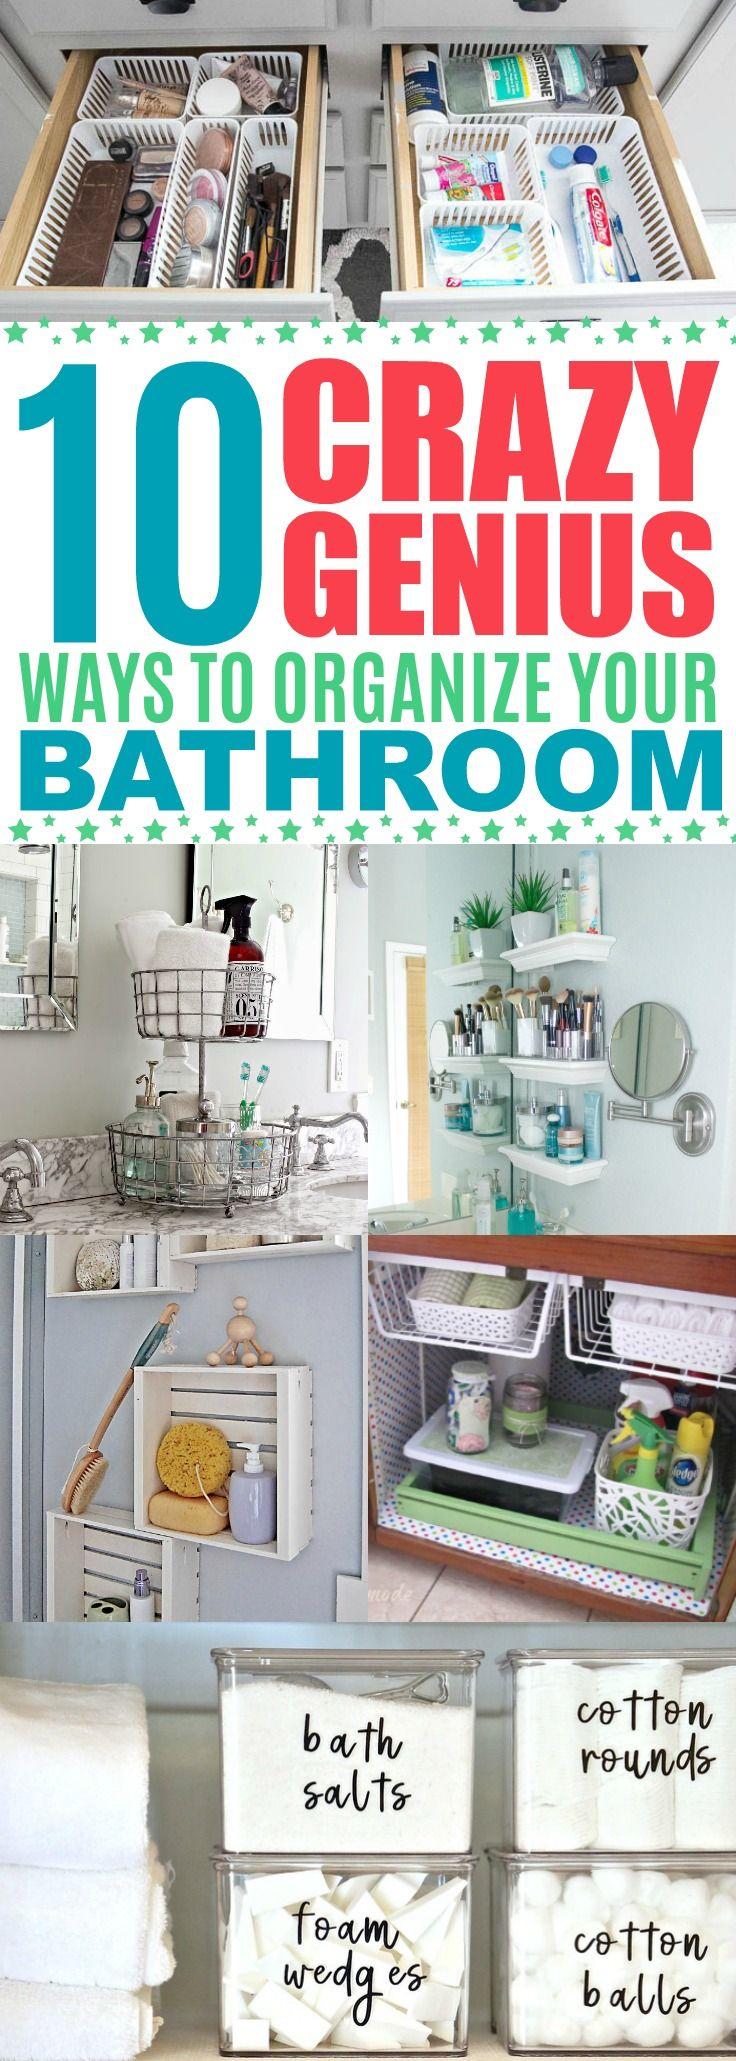 life changing ideas to organize your bathroom bathroom